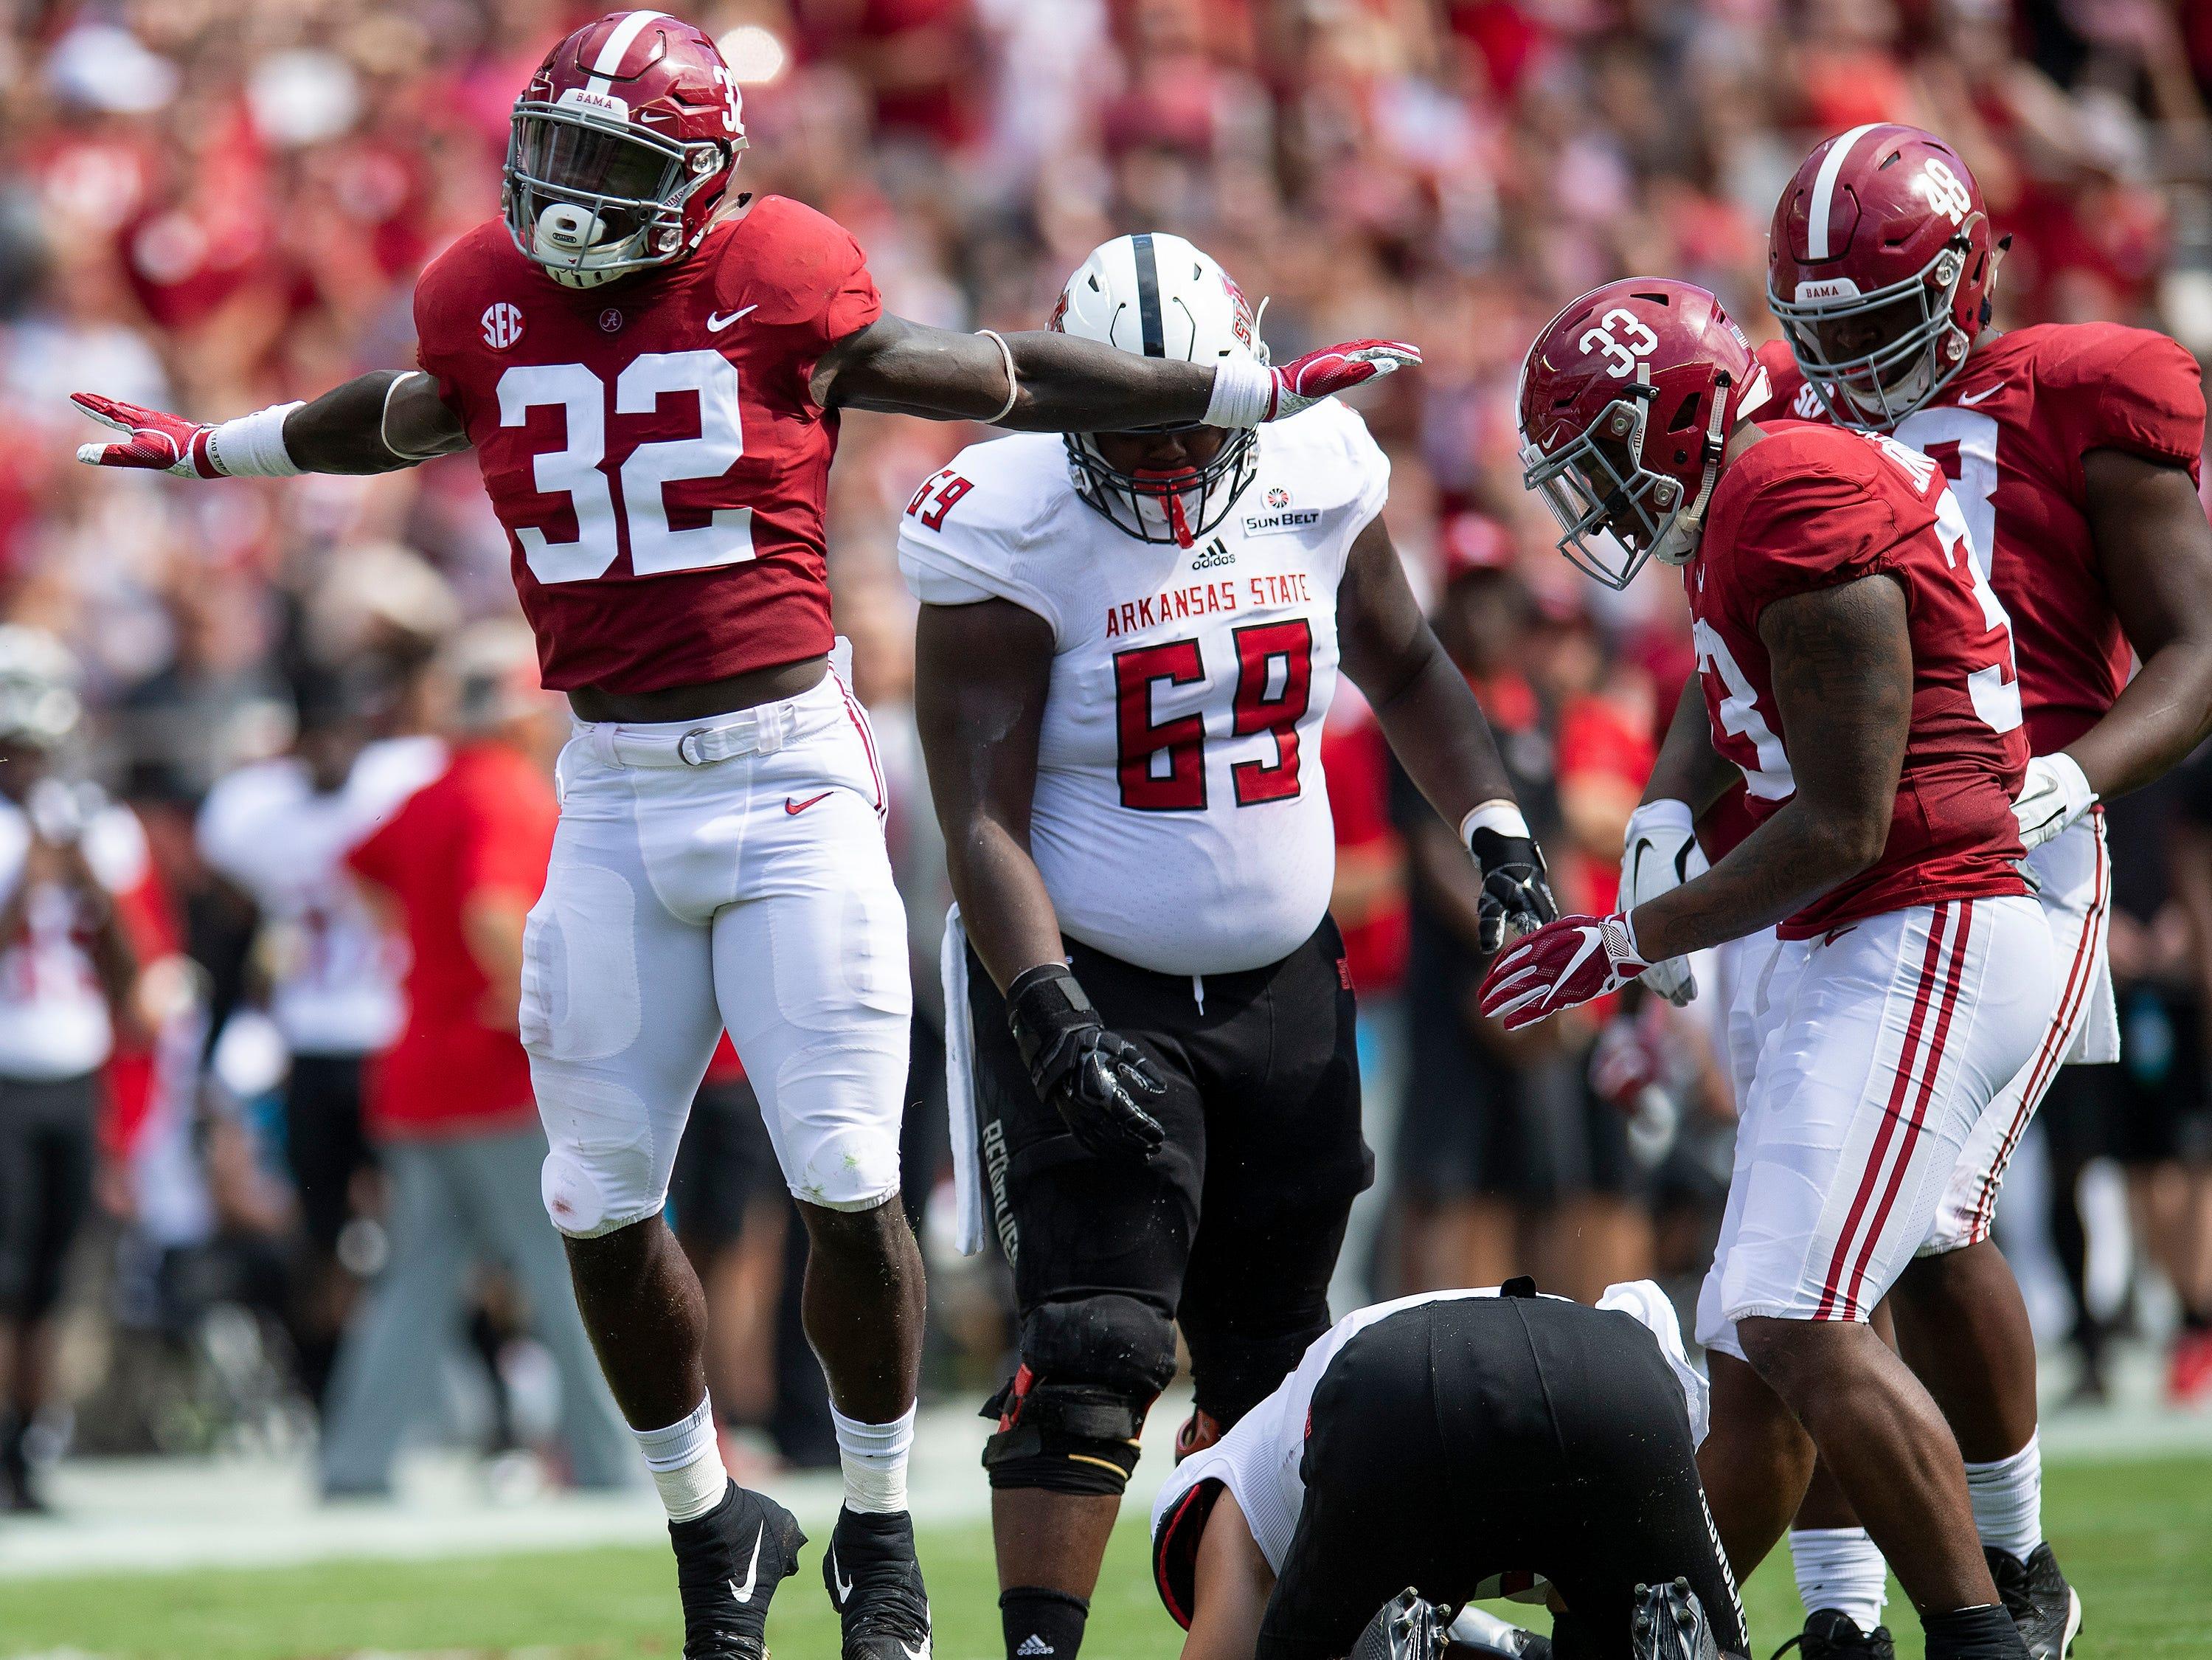 Alabama linebacker Dylan Moses (32) celebrates a sack of Arkansas State quarterback Justice Hansen (15) In first half action at Bryant Denny Stadium in Tuscaloosa, Ala., on Saturday September 8, 2018.